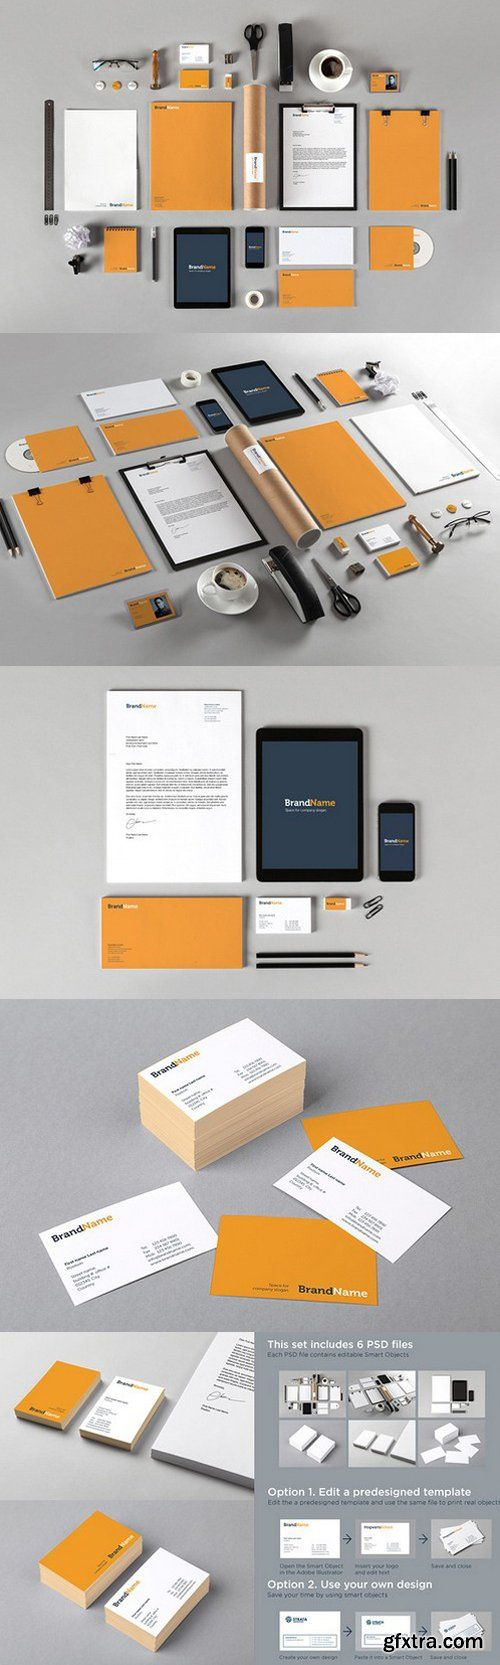 CM - Branding identity MockUps + Template 626846